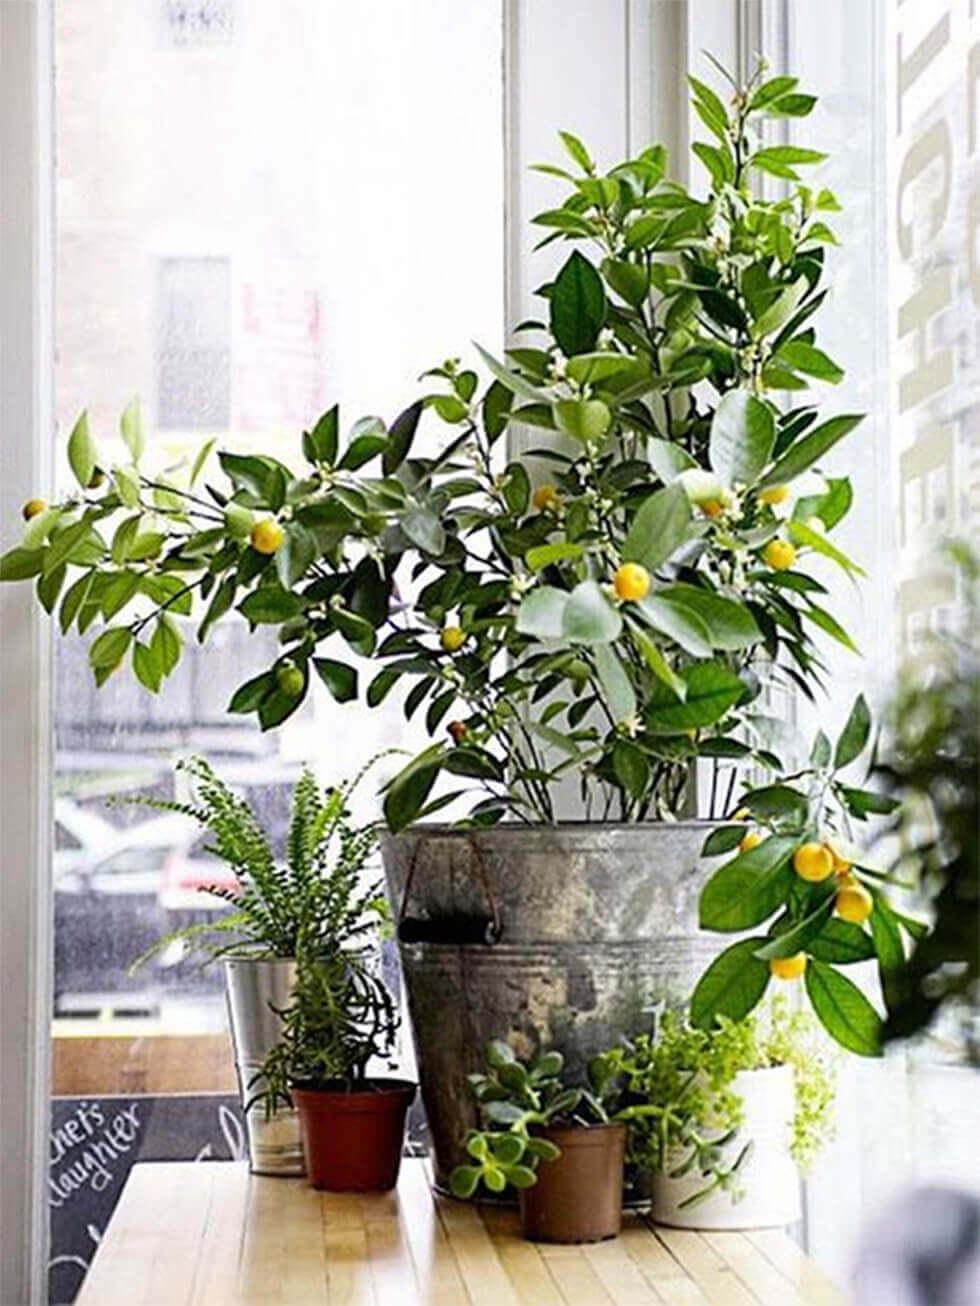 Citrus fruit tree grown indoors.